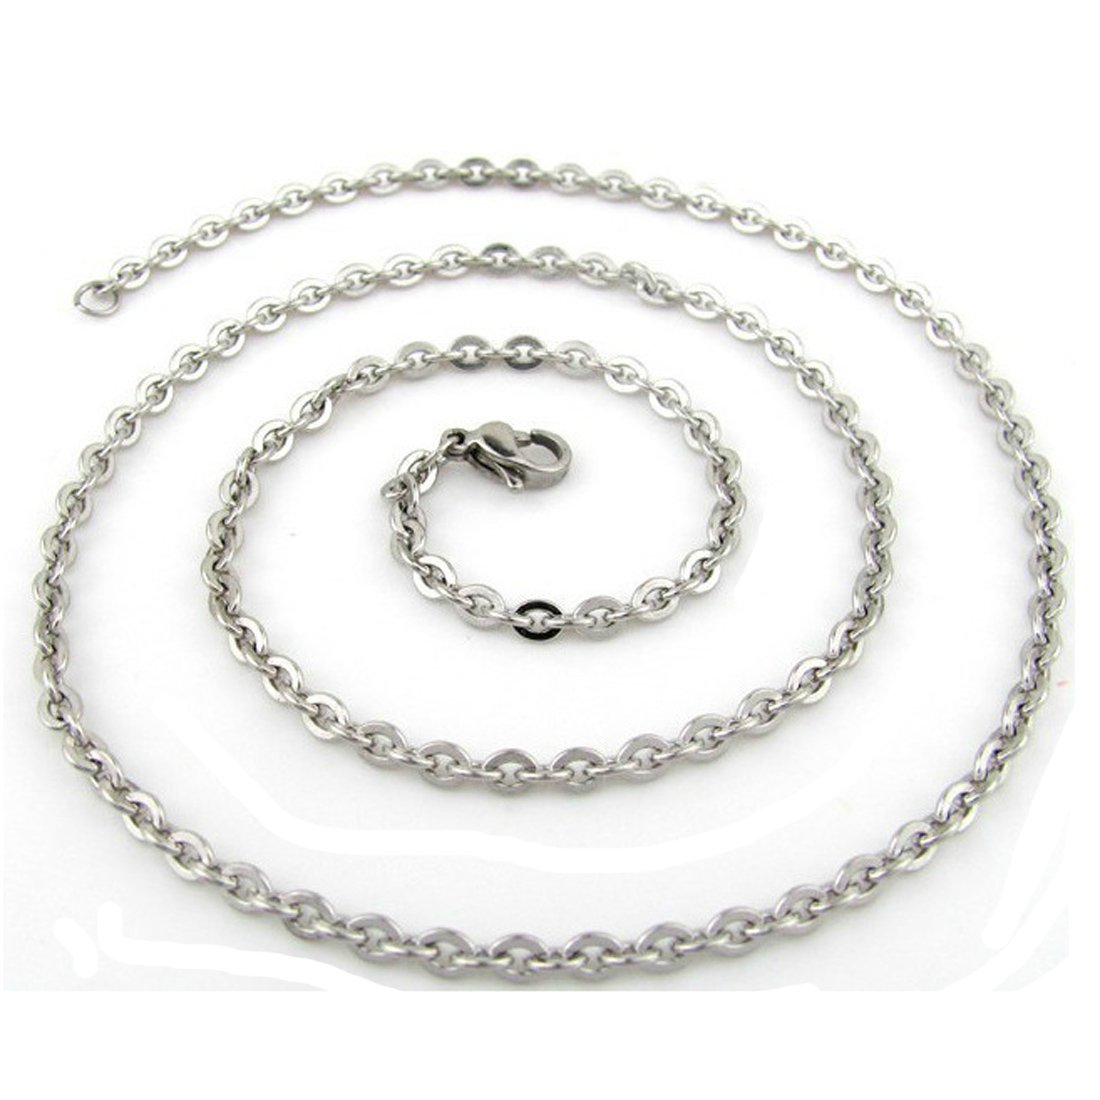 50pcs Wholesale Bulk Women's Silver Tone Stainless Steel Welding Rolo Necklace Chain 2mm No Fade